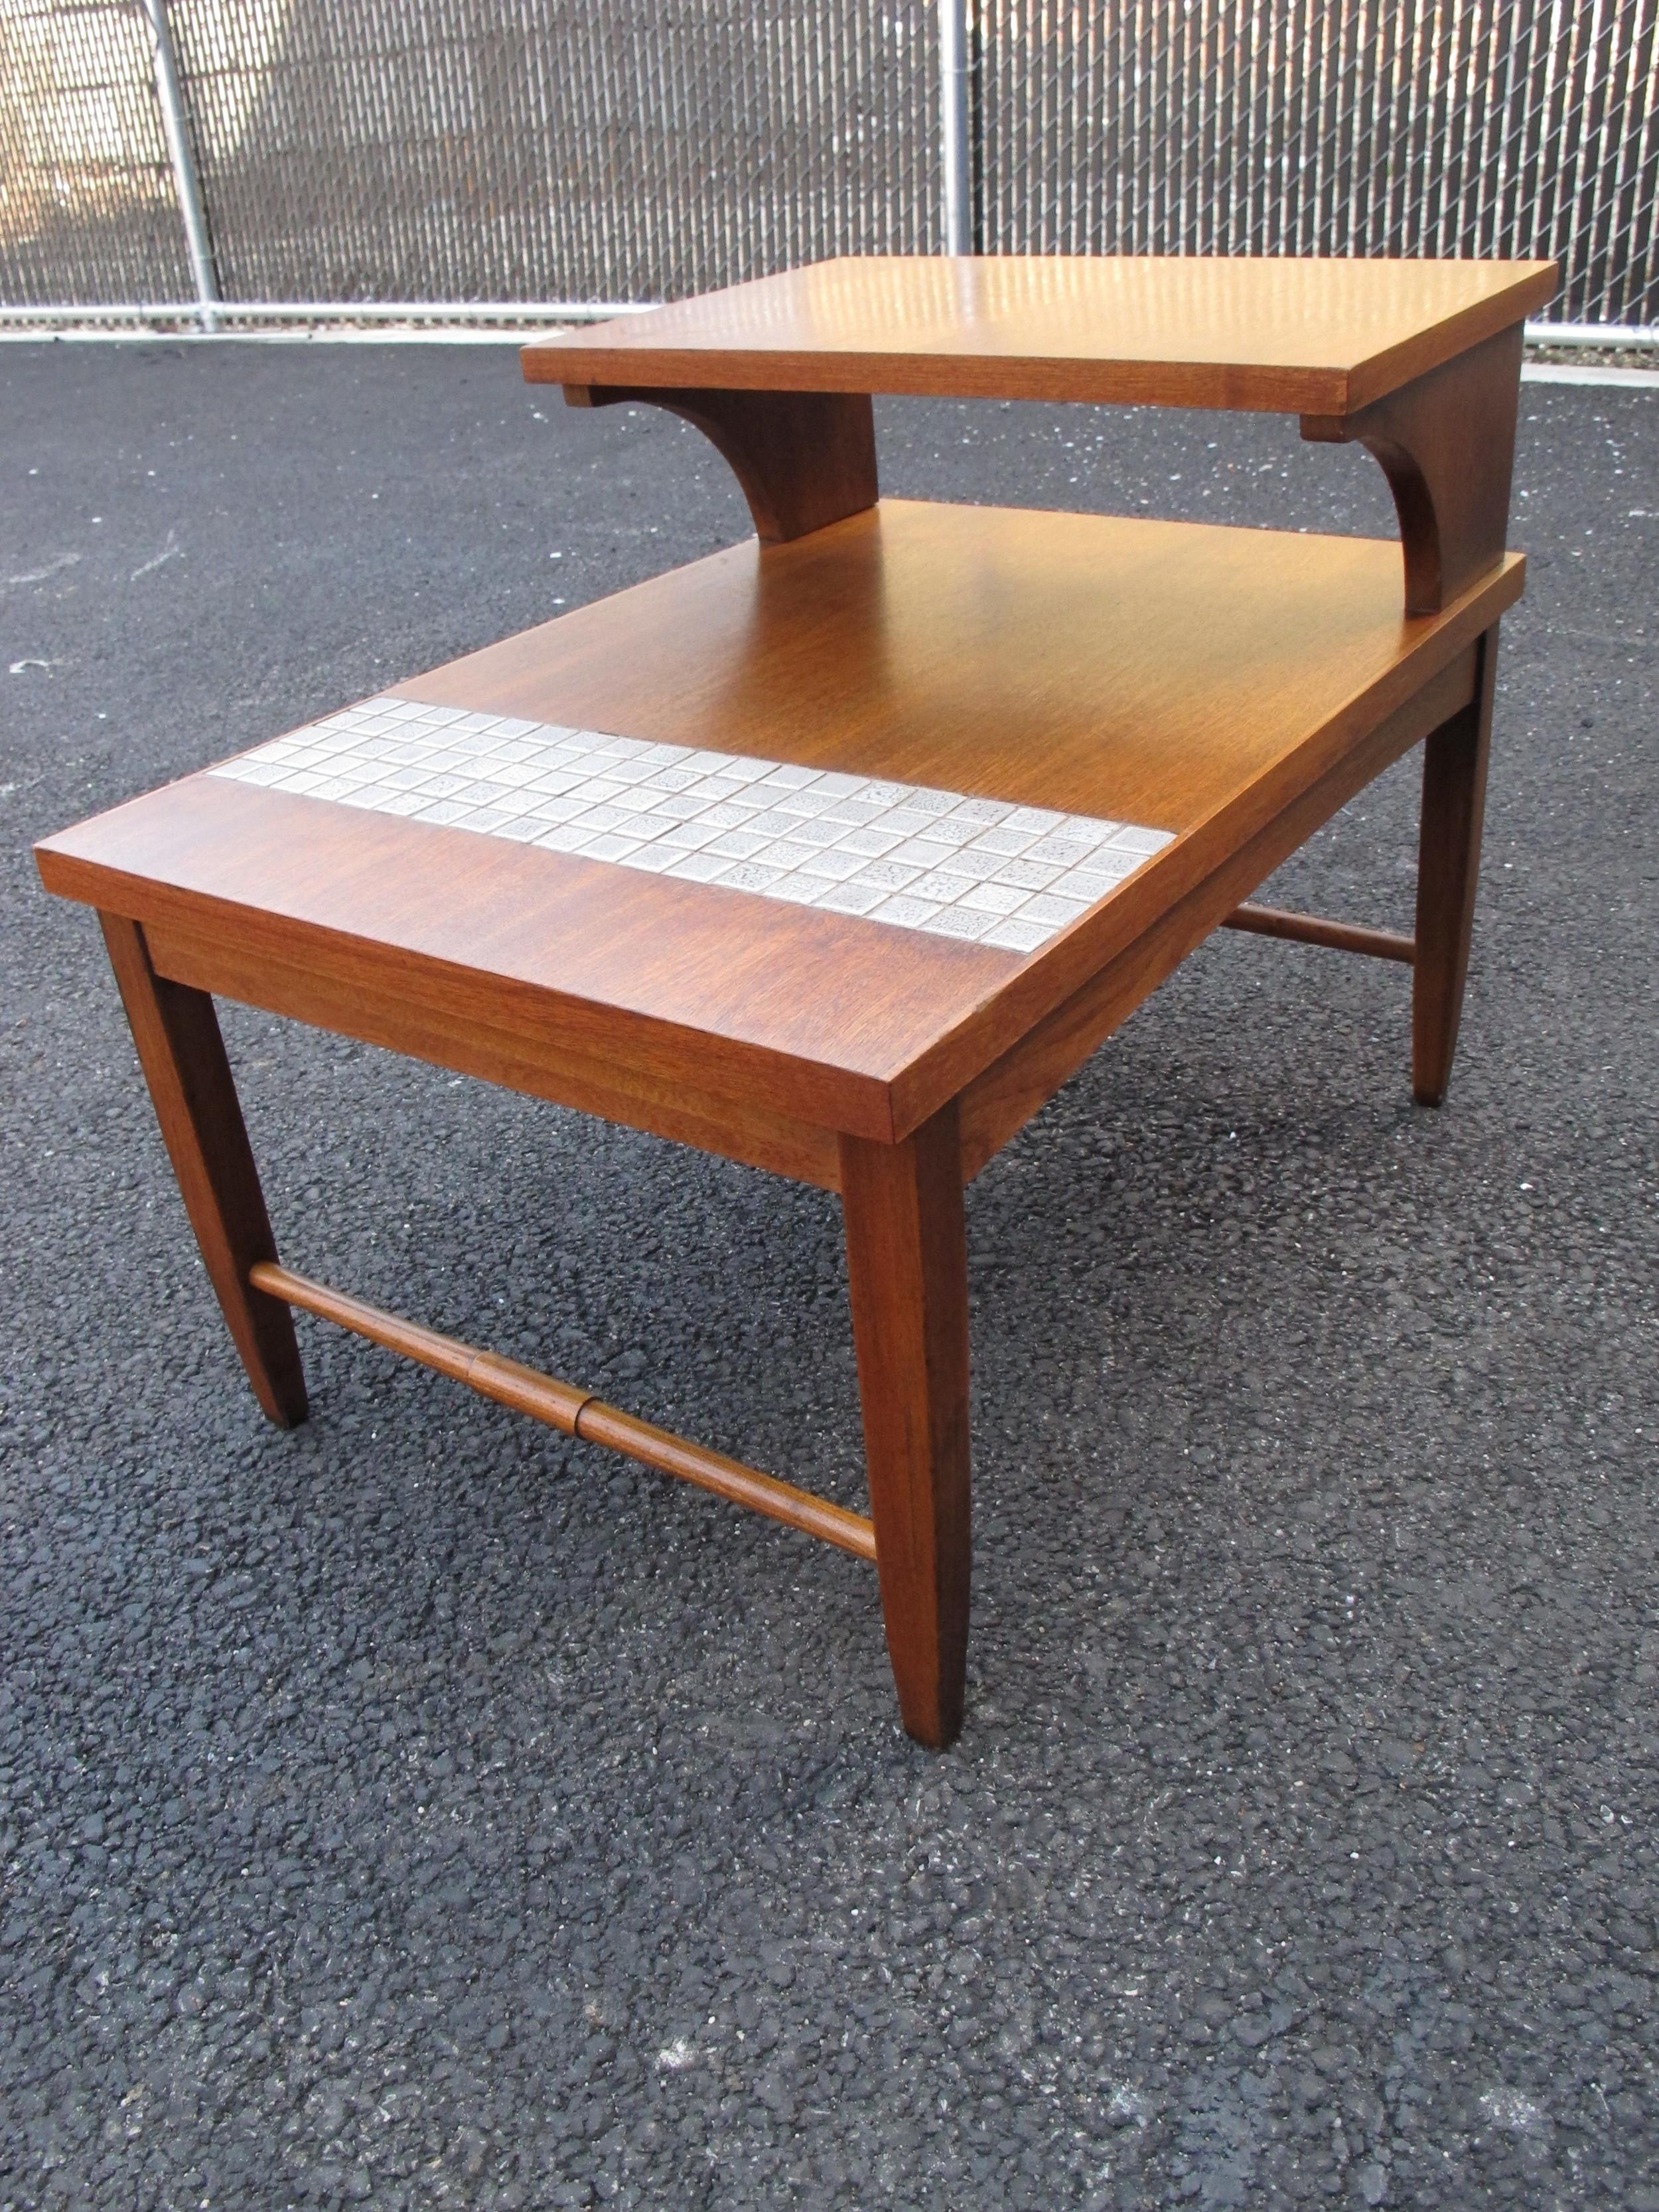 LANE TILED END TABLE